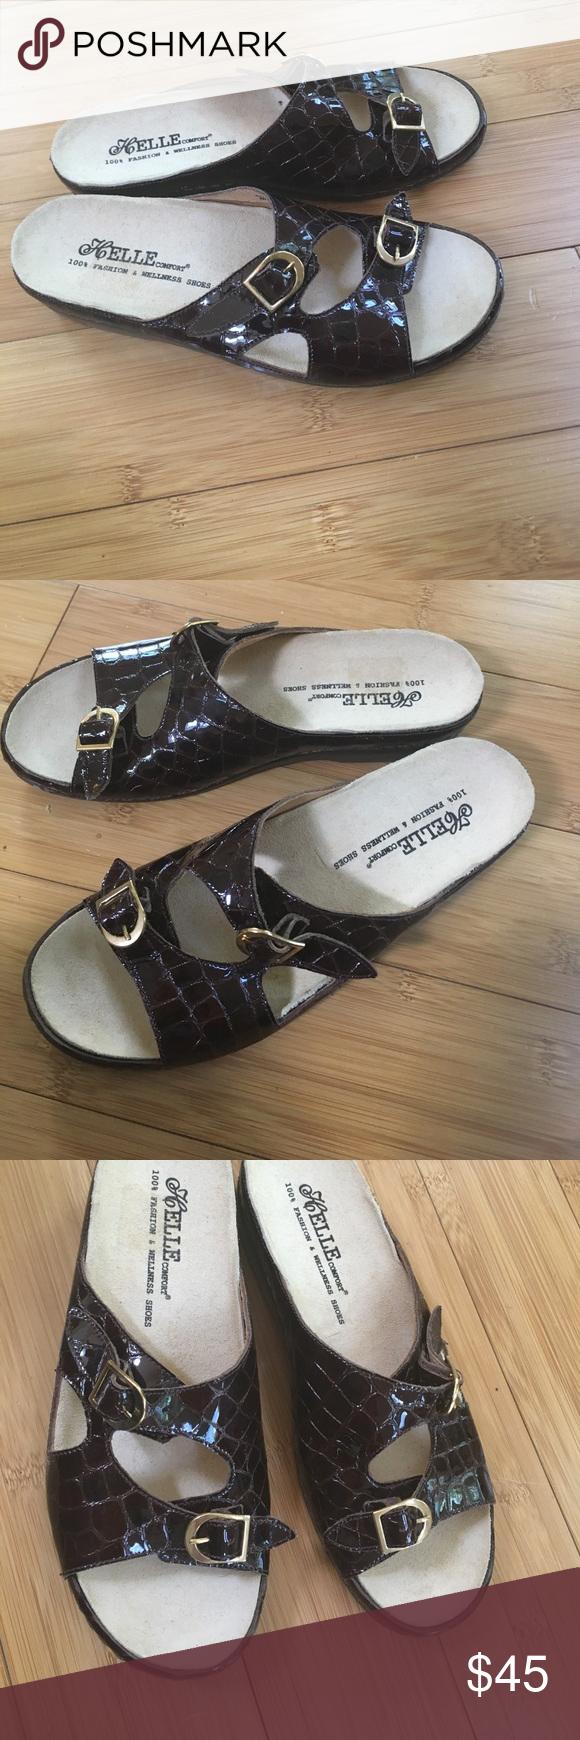 women genuine womens canada outlet croc shoes comforter helle luxury p slide sandals comfort takara s black